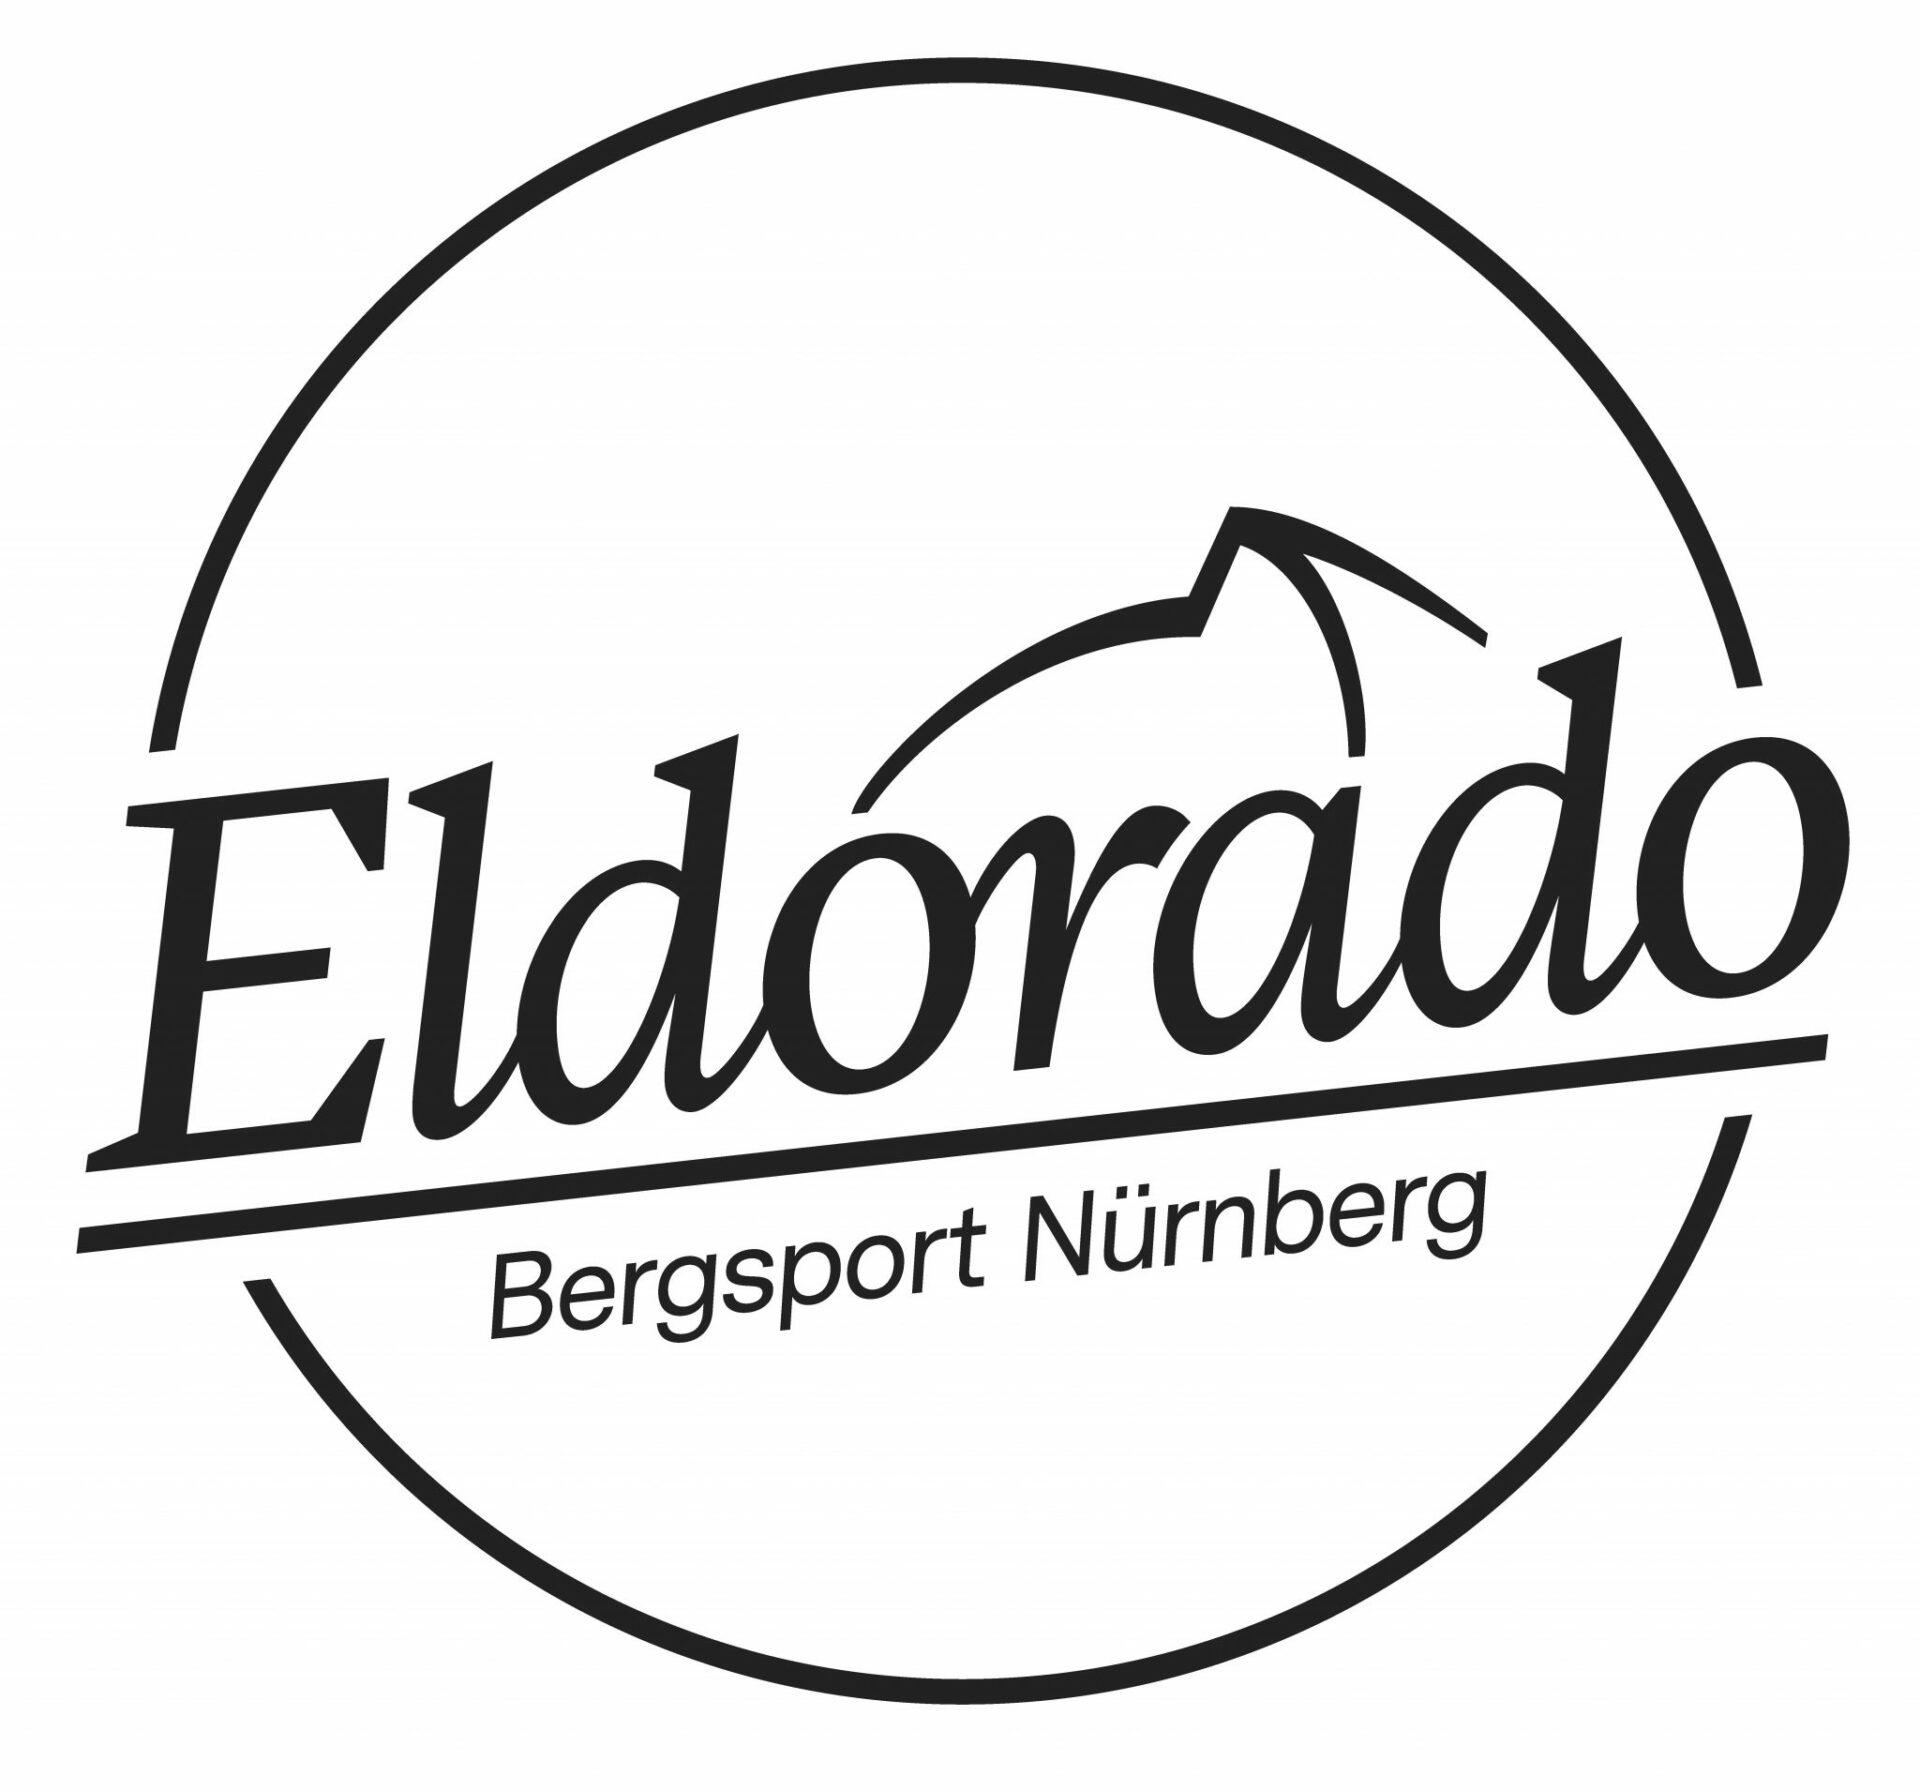 Logo Eldorado Bergsport Nürnberg